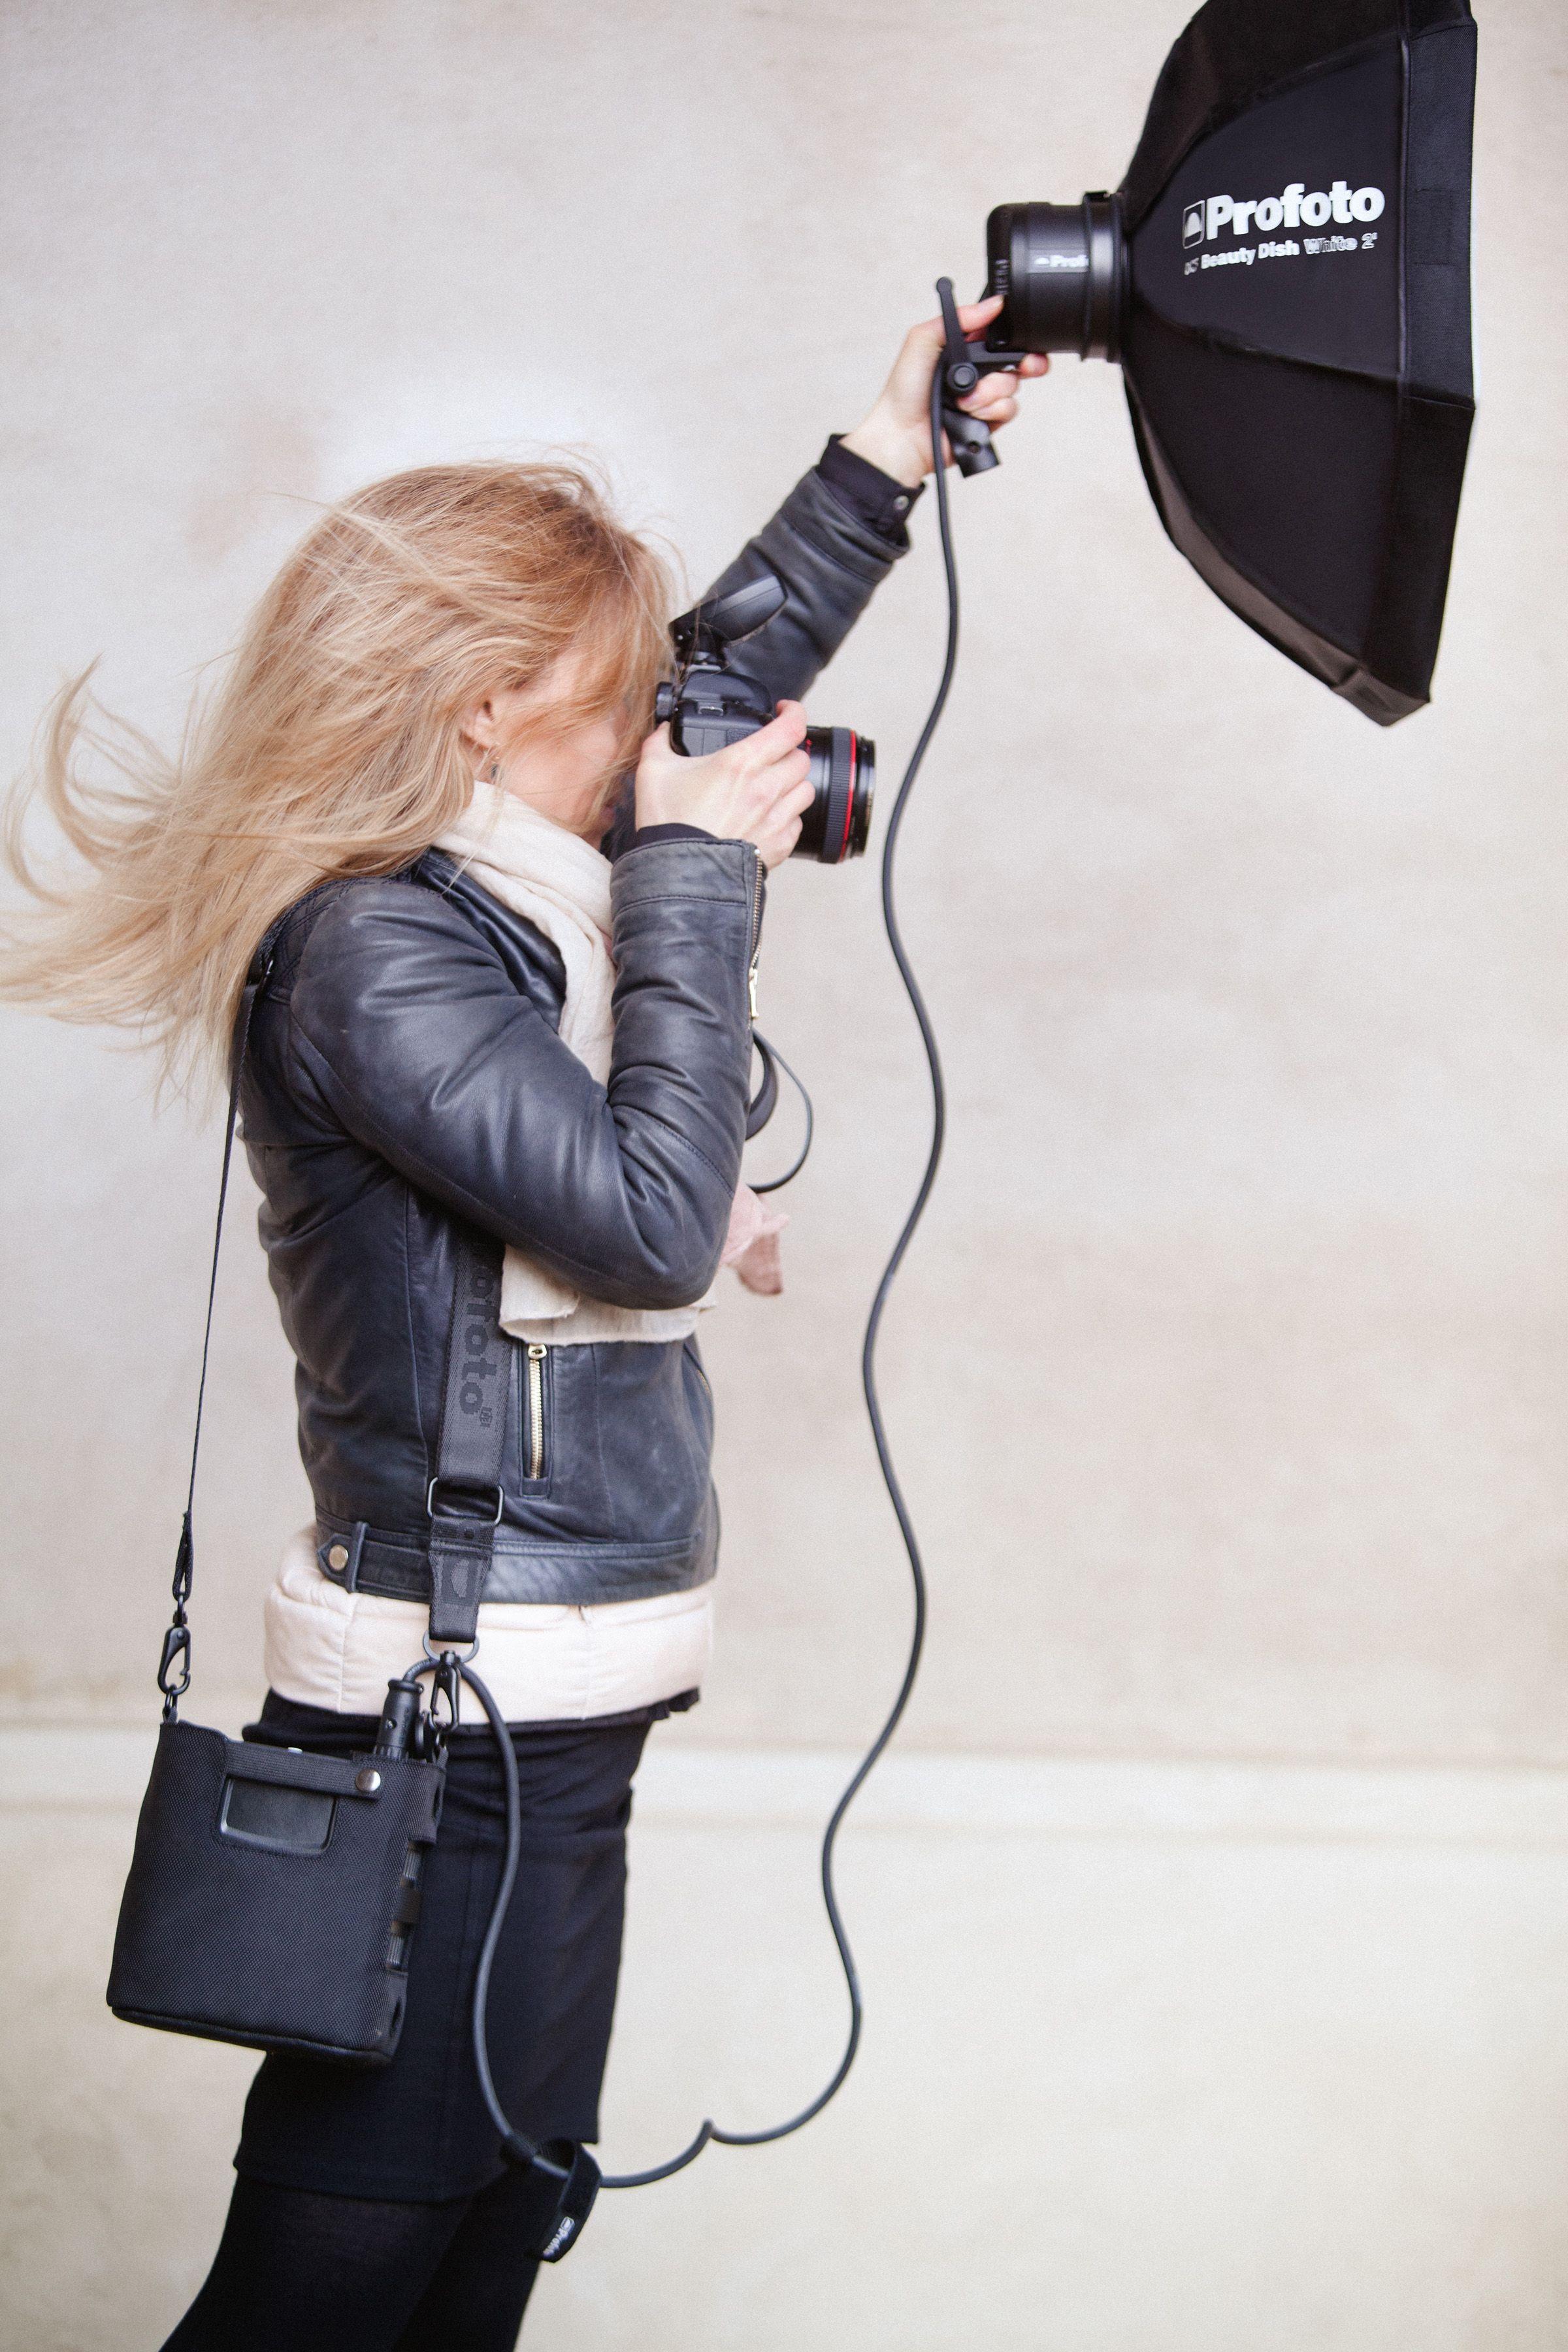 21 Profoto Investment Ideas Profoto Light Photography Photo Lighting